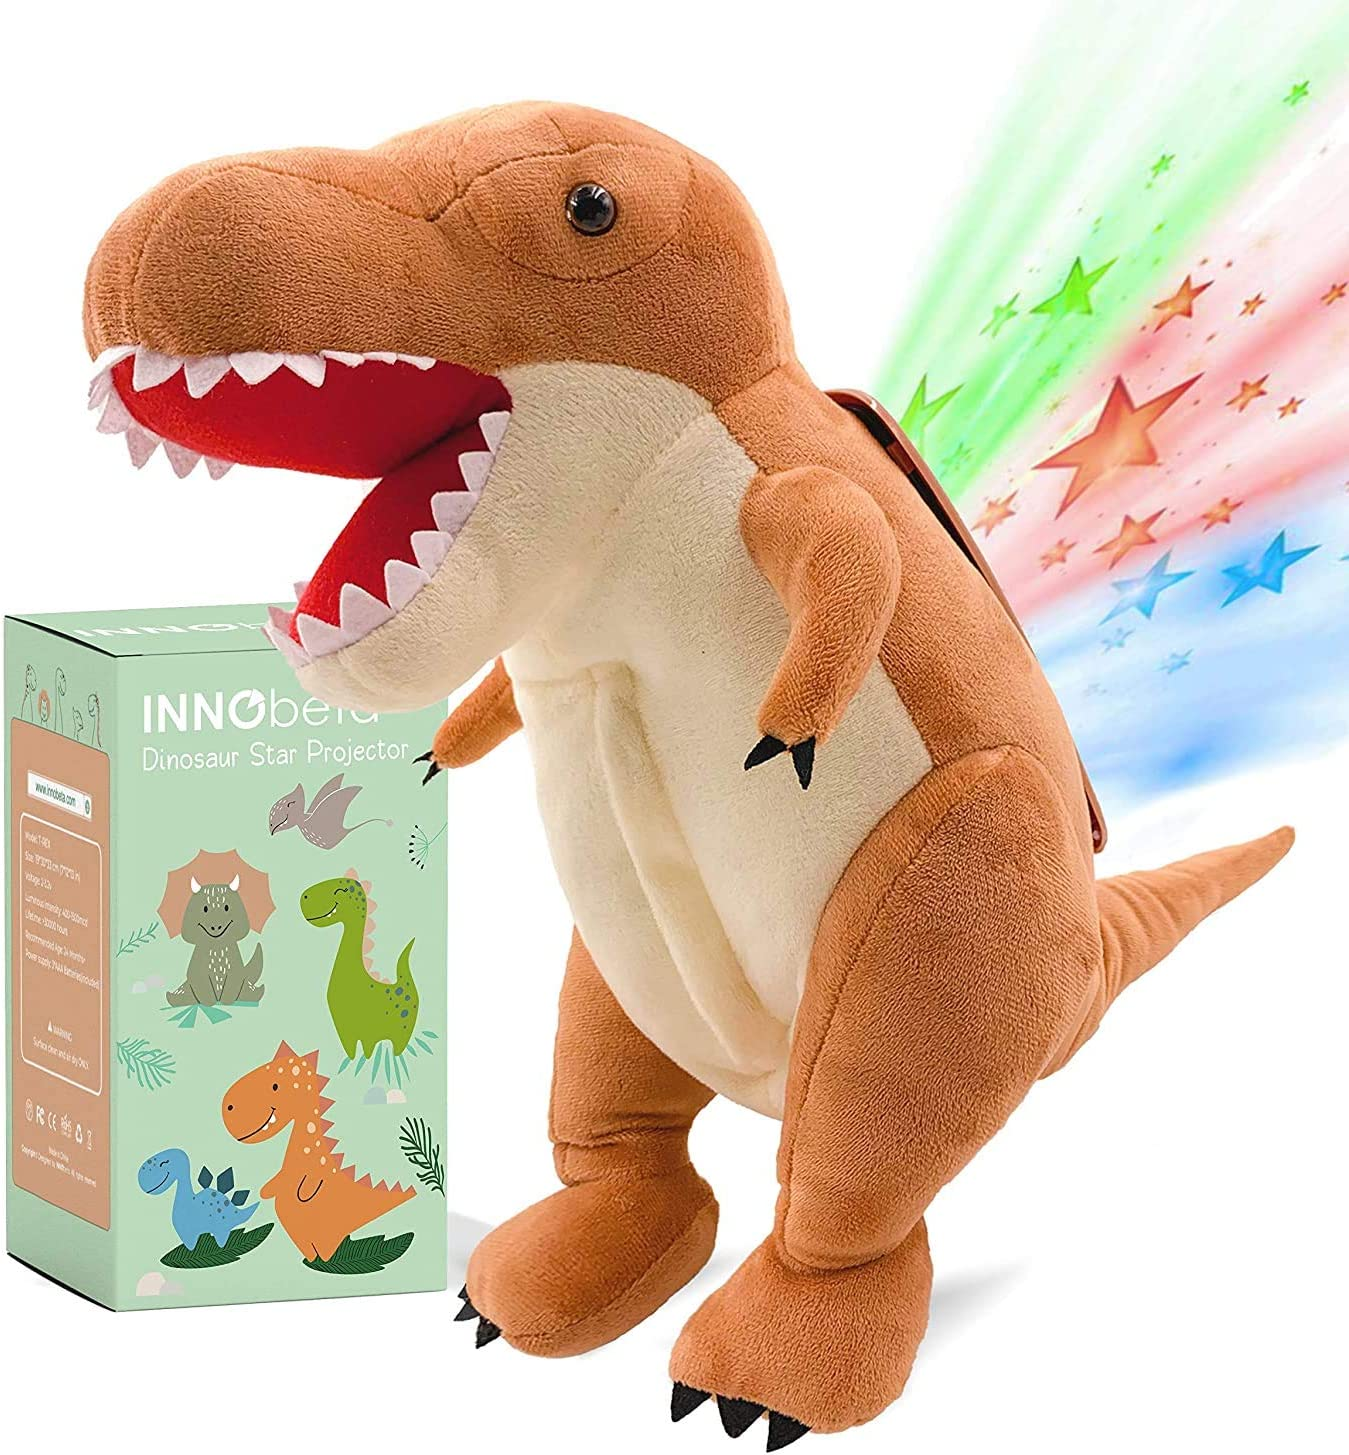 Dinosaur Nursery Decor Dinosaur Star Projector Night Light Toddlers 14 T-Rex Stuffed Animal Plush Baby Sleep Soother Birthday Gifts for Boys Kids Girls INNObeta